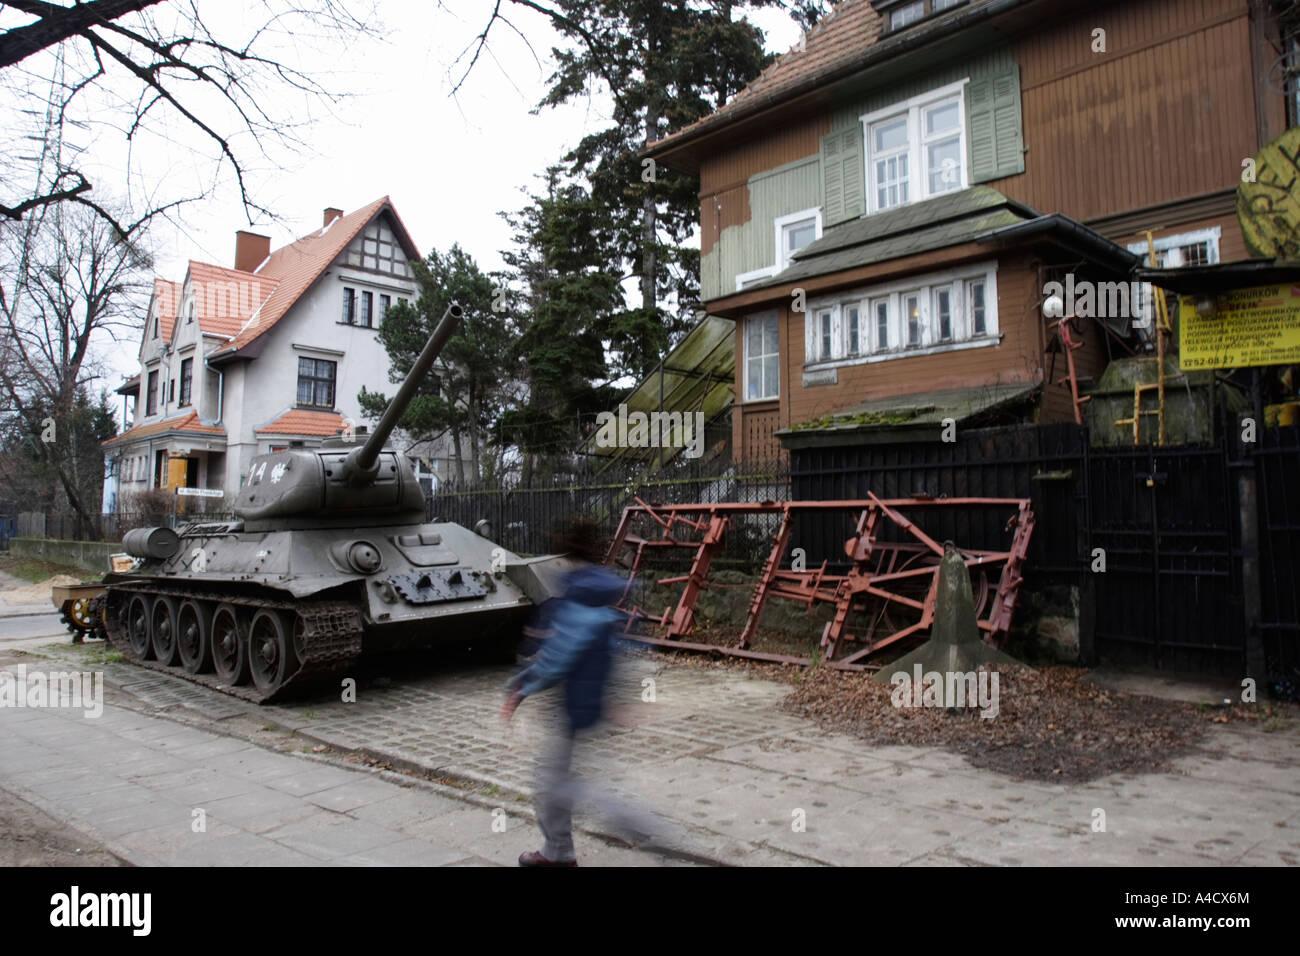 POLAND, SOPOT, 26.12.2006. Tank T34 in front of Villa Bekin Stock Photo